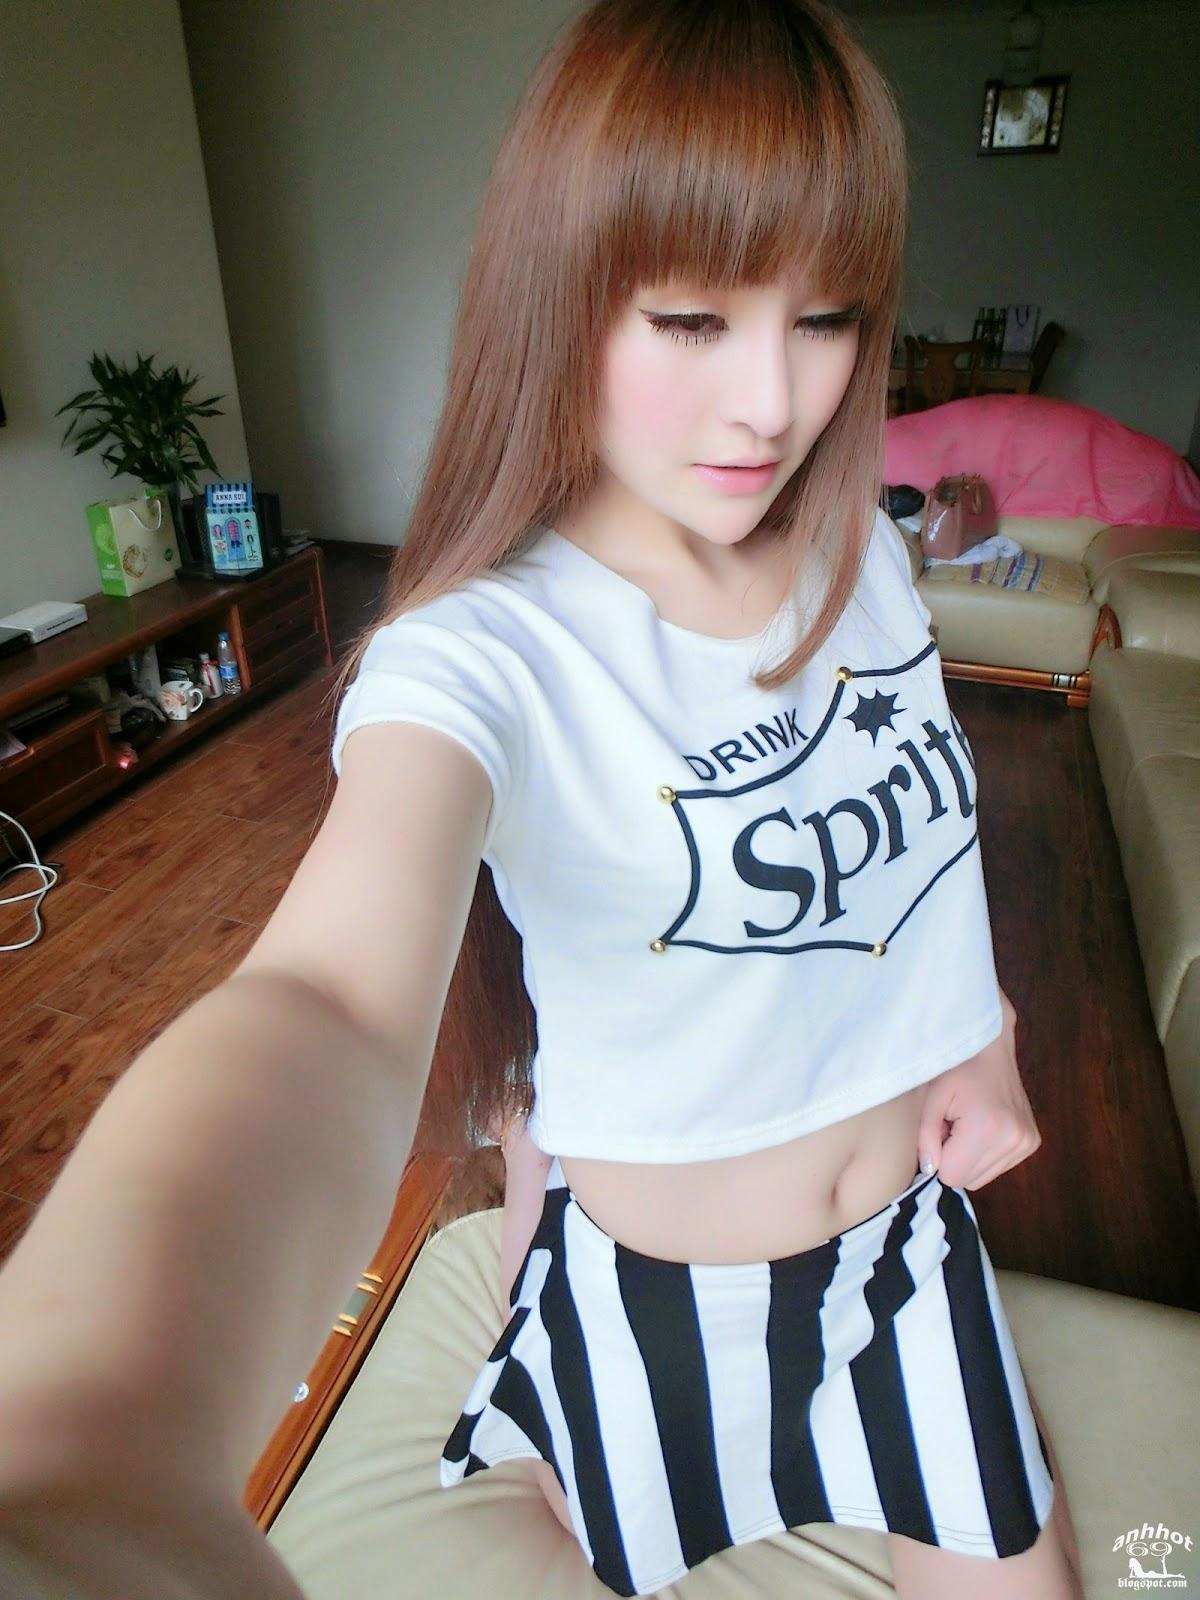 Suxia_h5_117491696565388562o